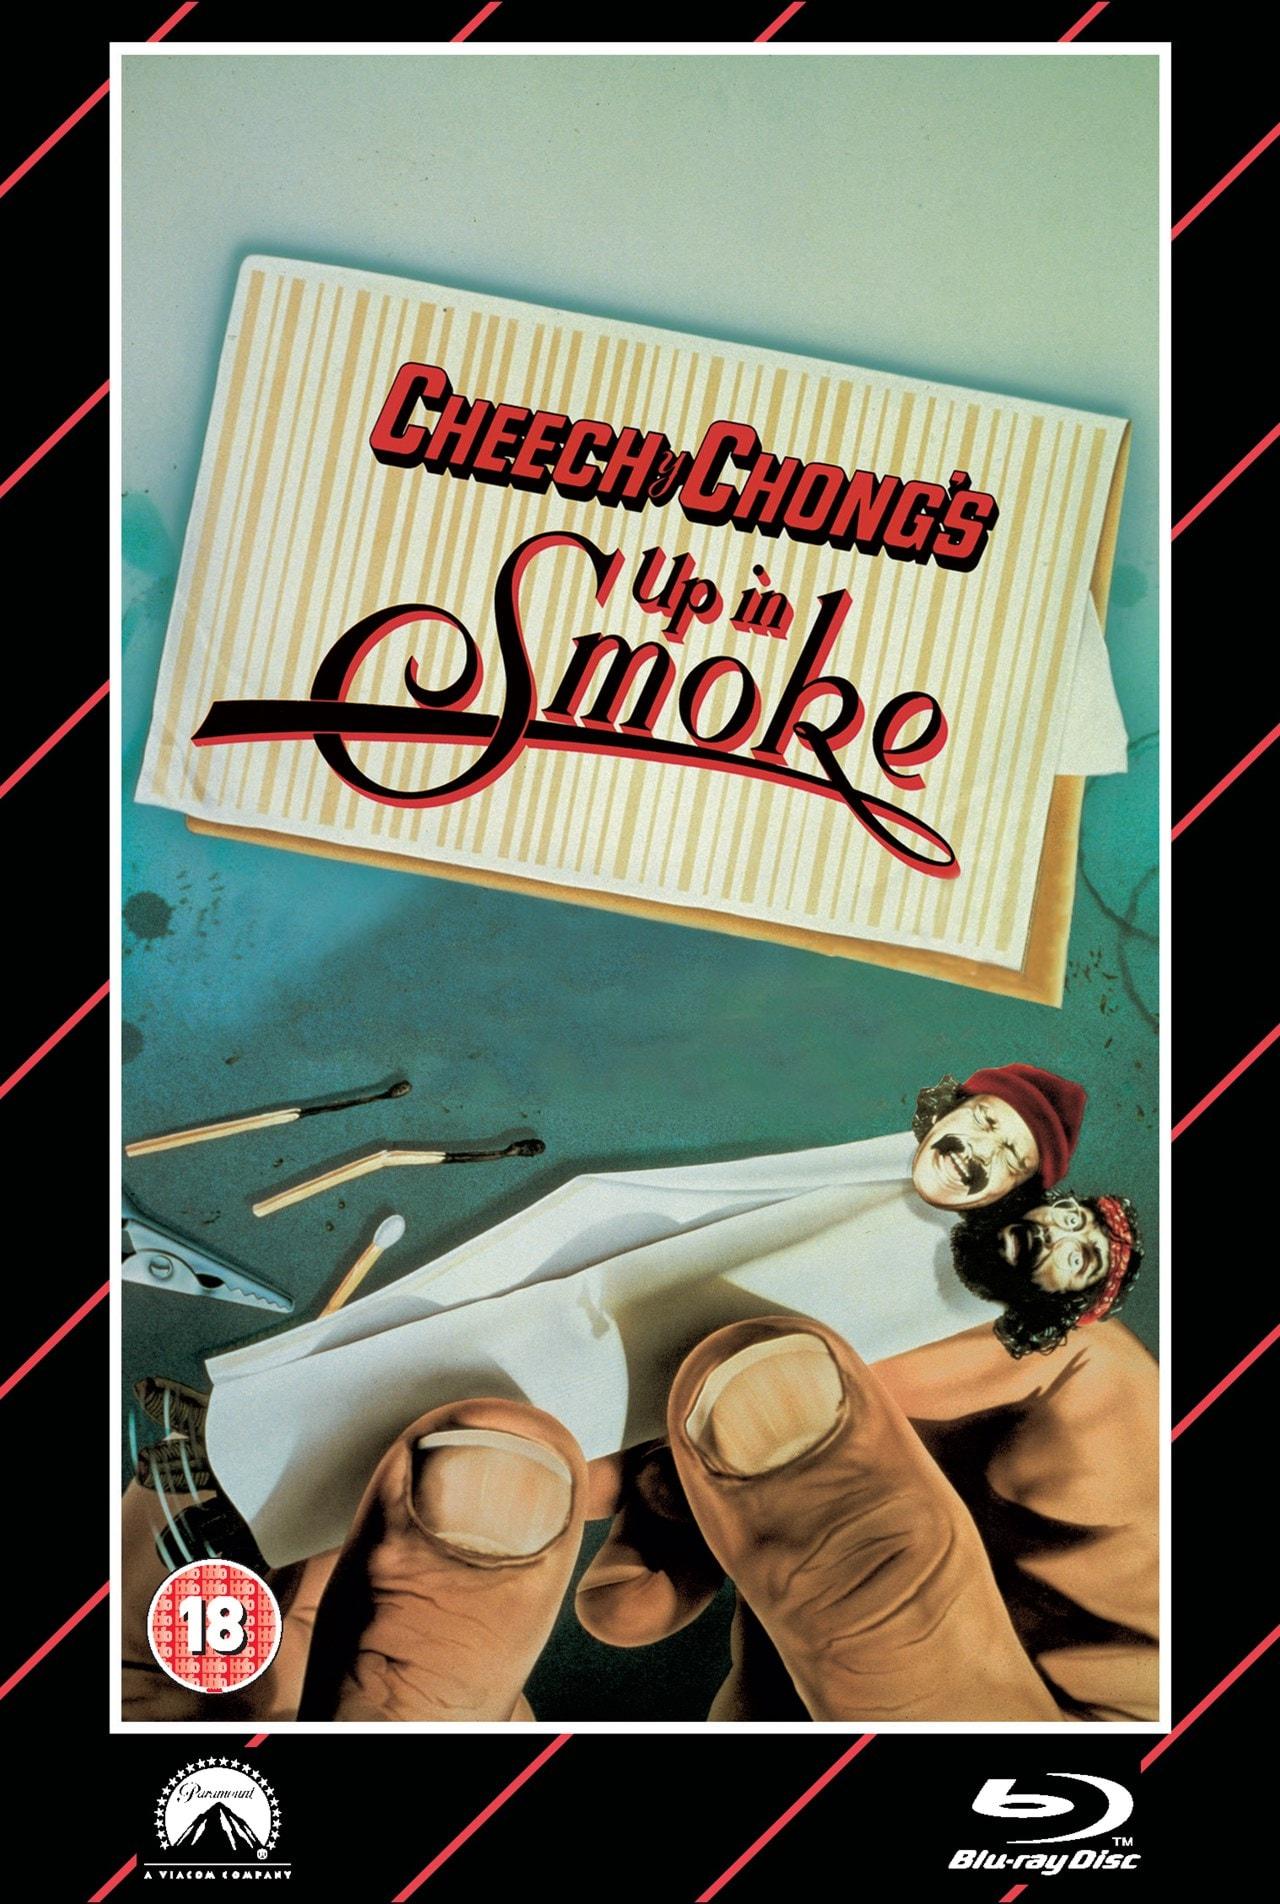 Cheech and Chong's Up in Smoke - VHS Range - 1